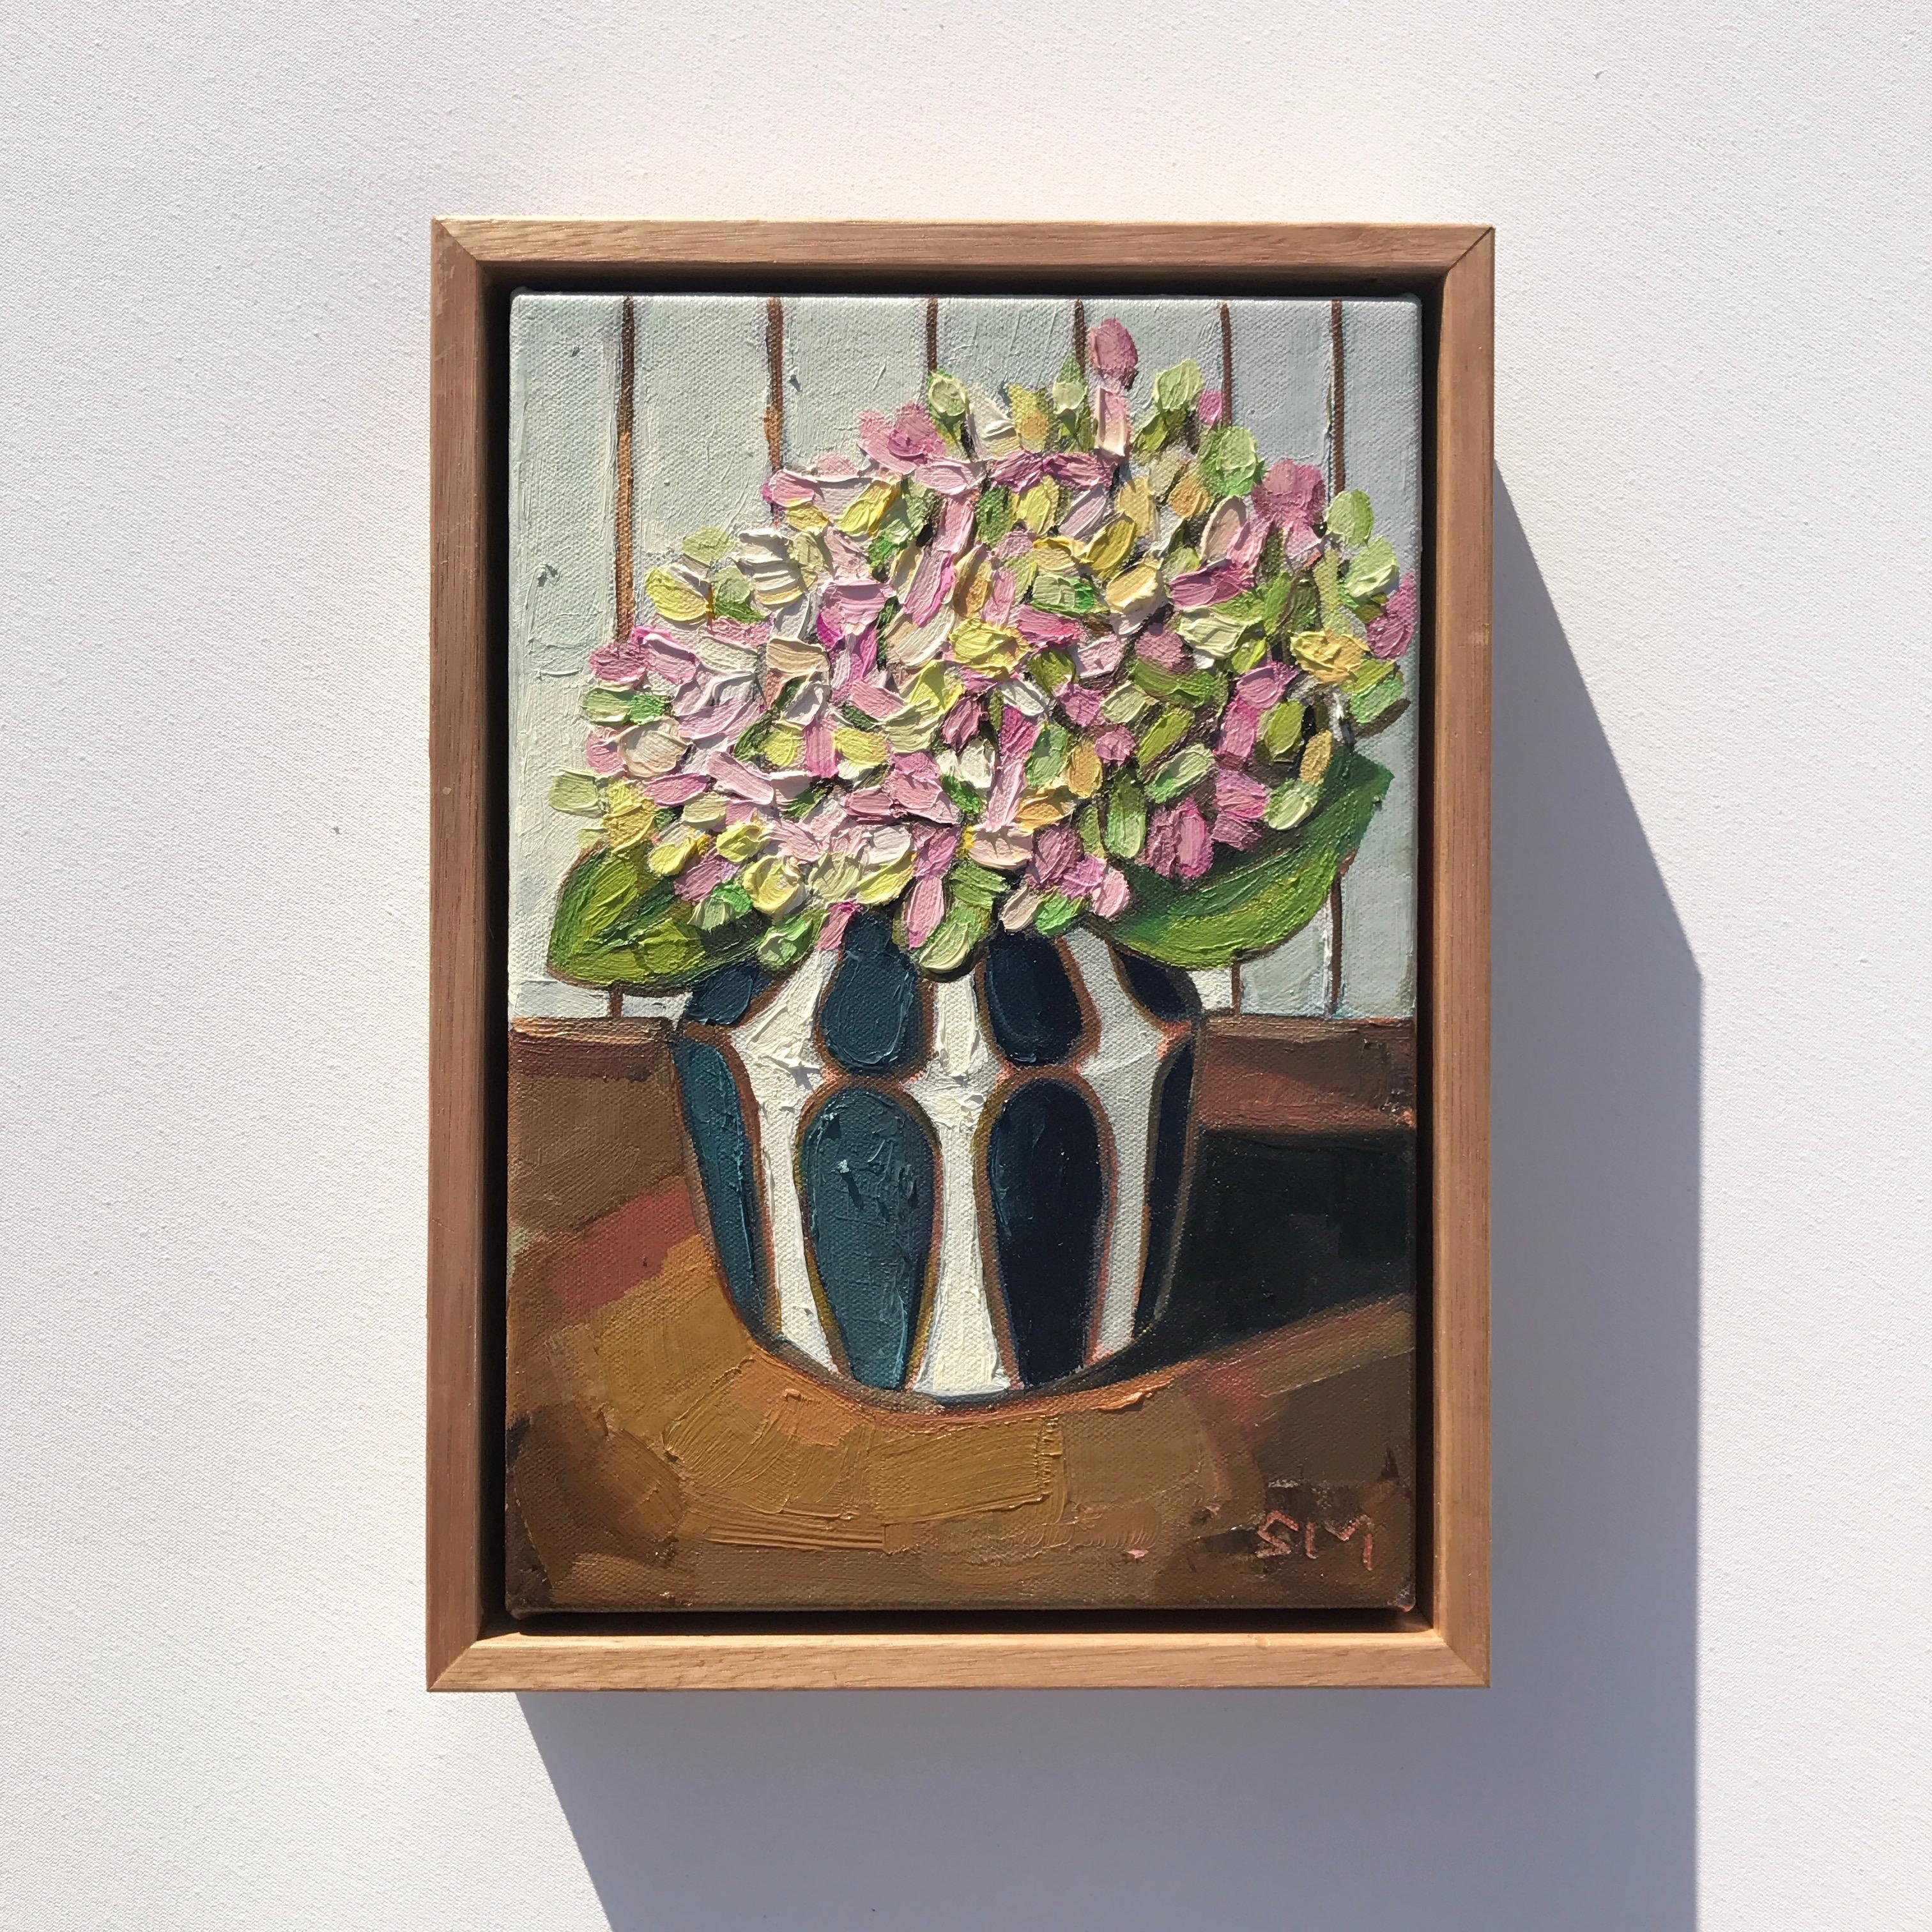 07_17 'Hydrangeas & Pastel' 29x21 $495